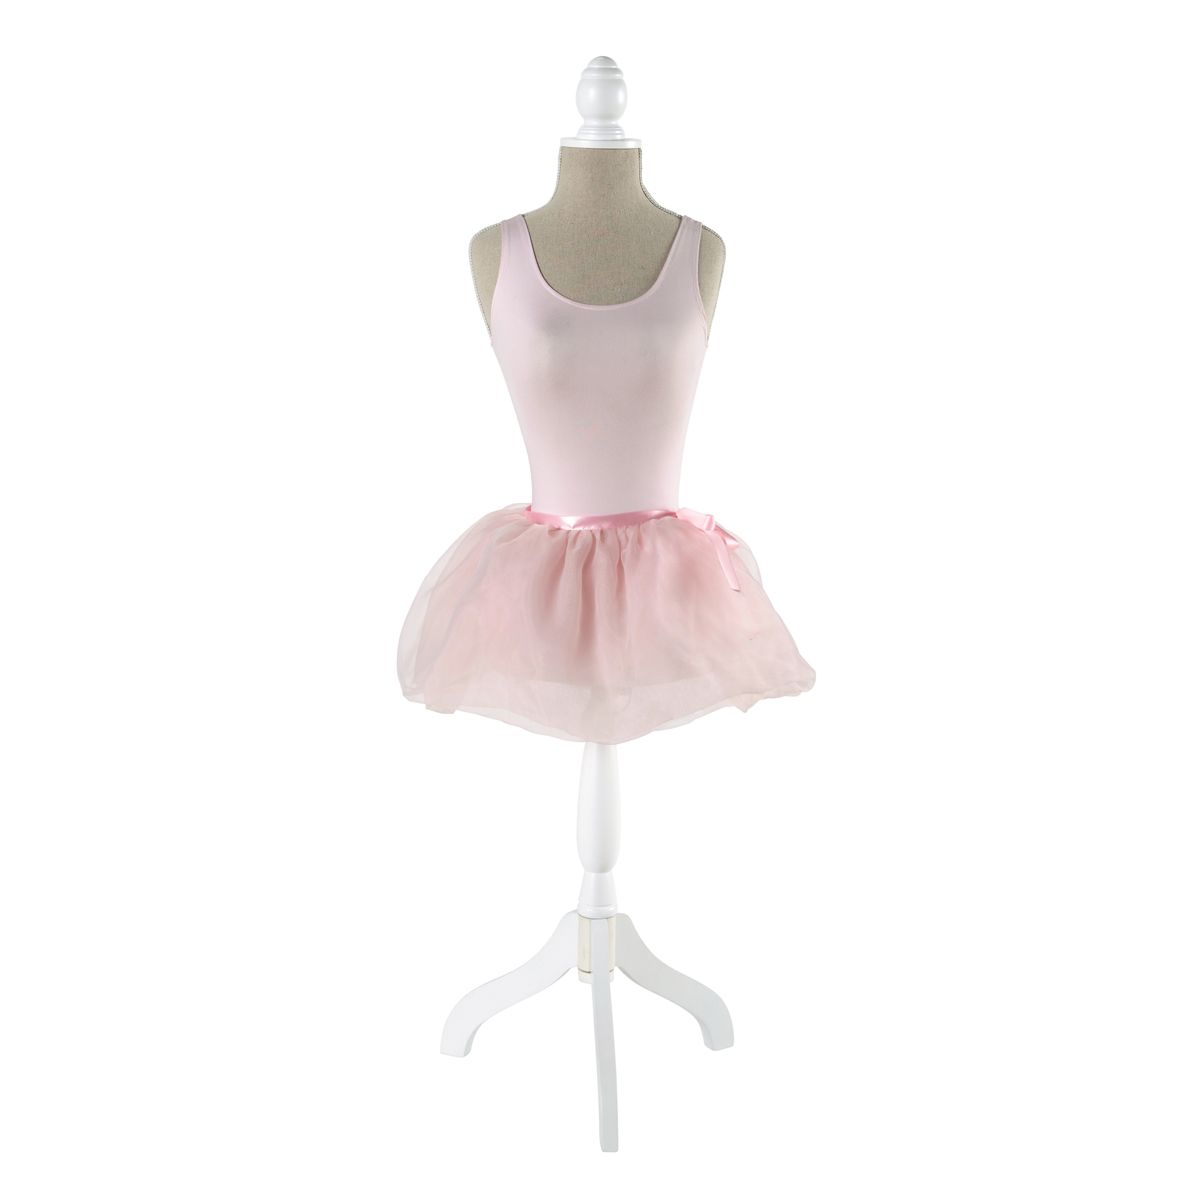 mannequin couture tutu danseuse dco chambre adolescente pinterest couture tutus and sewing - Maison Du Monde Ballerina